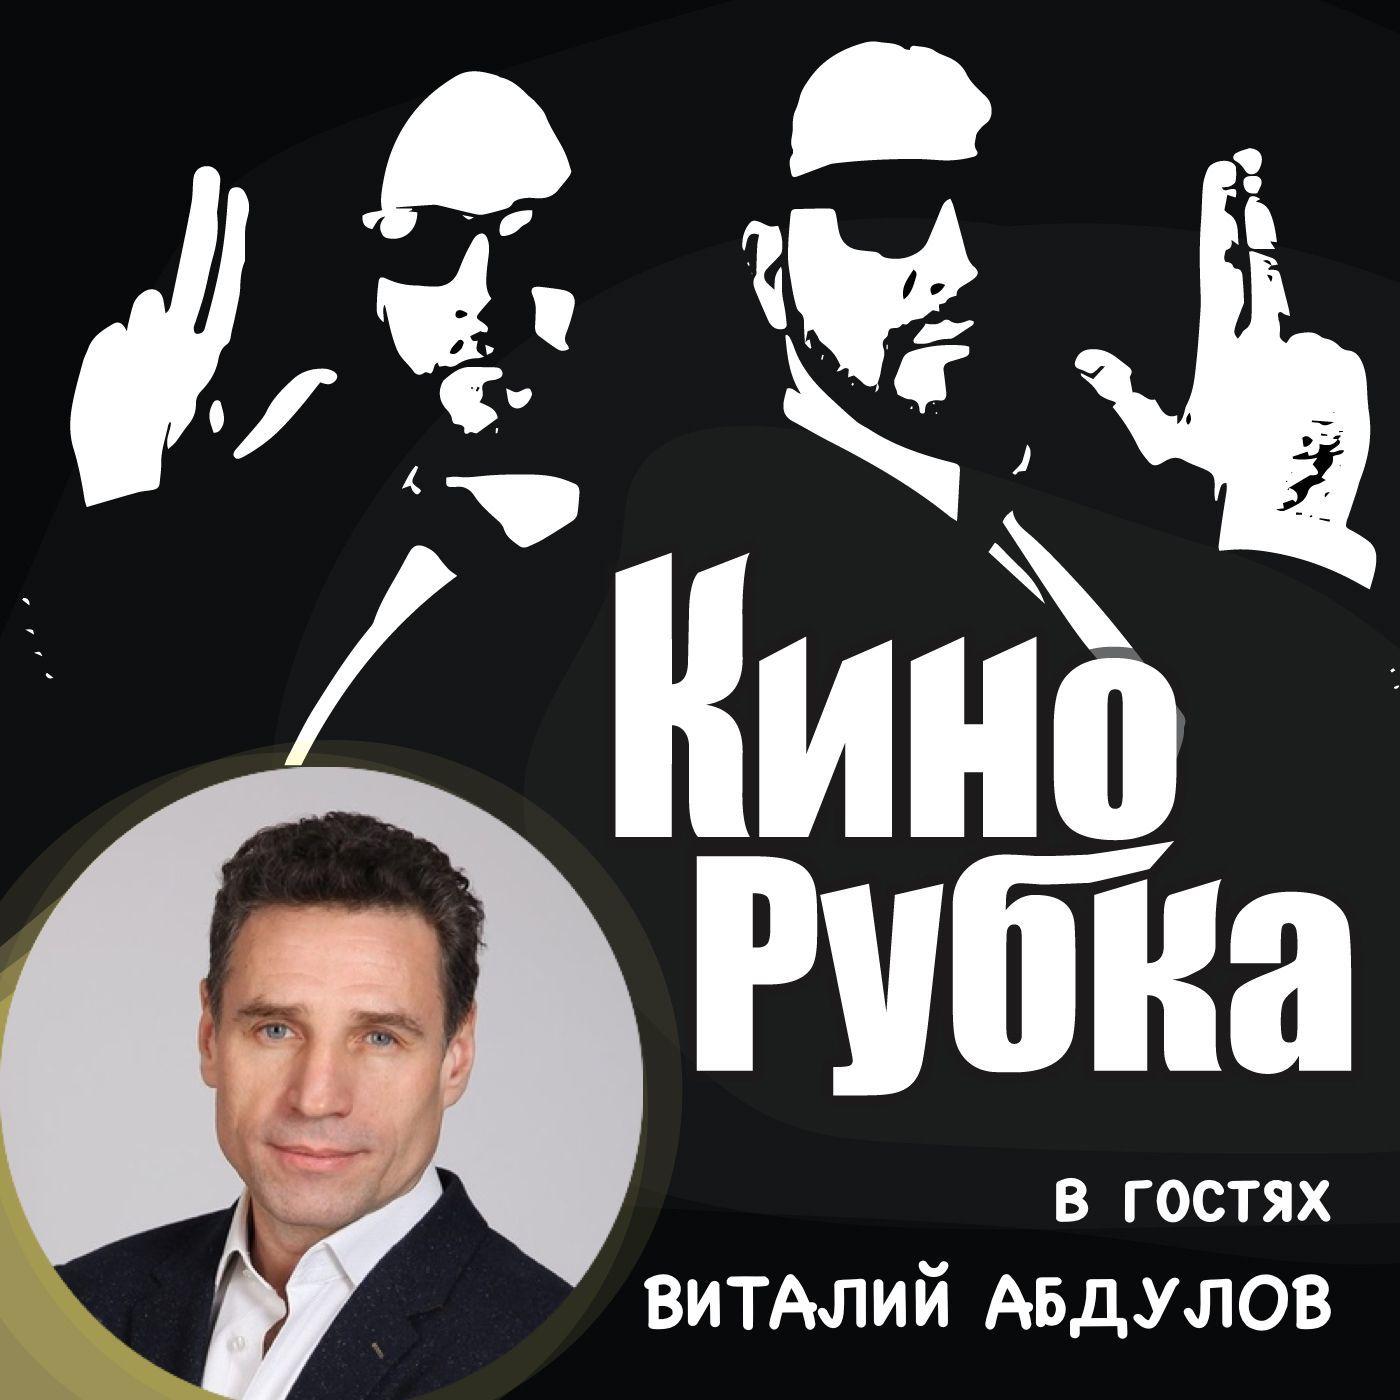 Актер театра и кино Виталий Абдулов